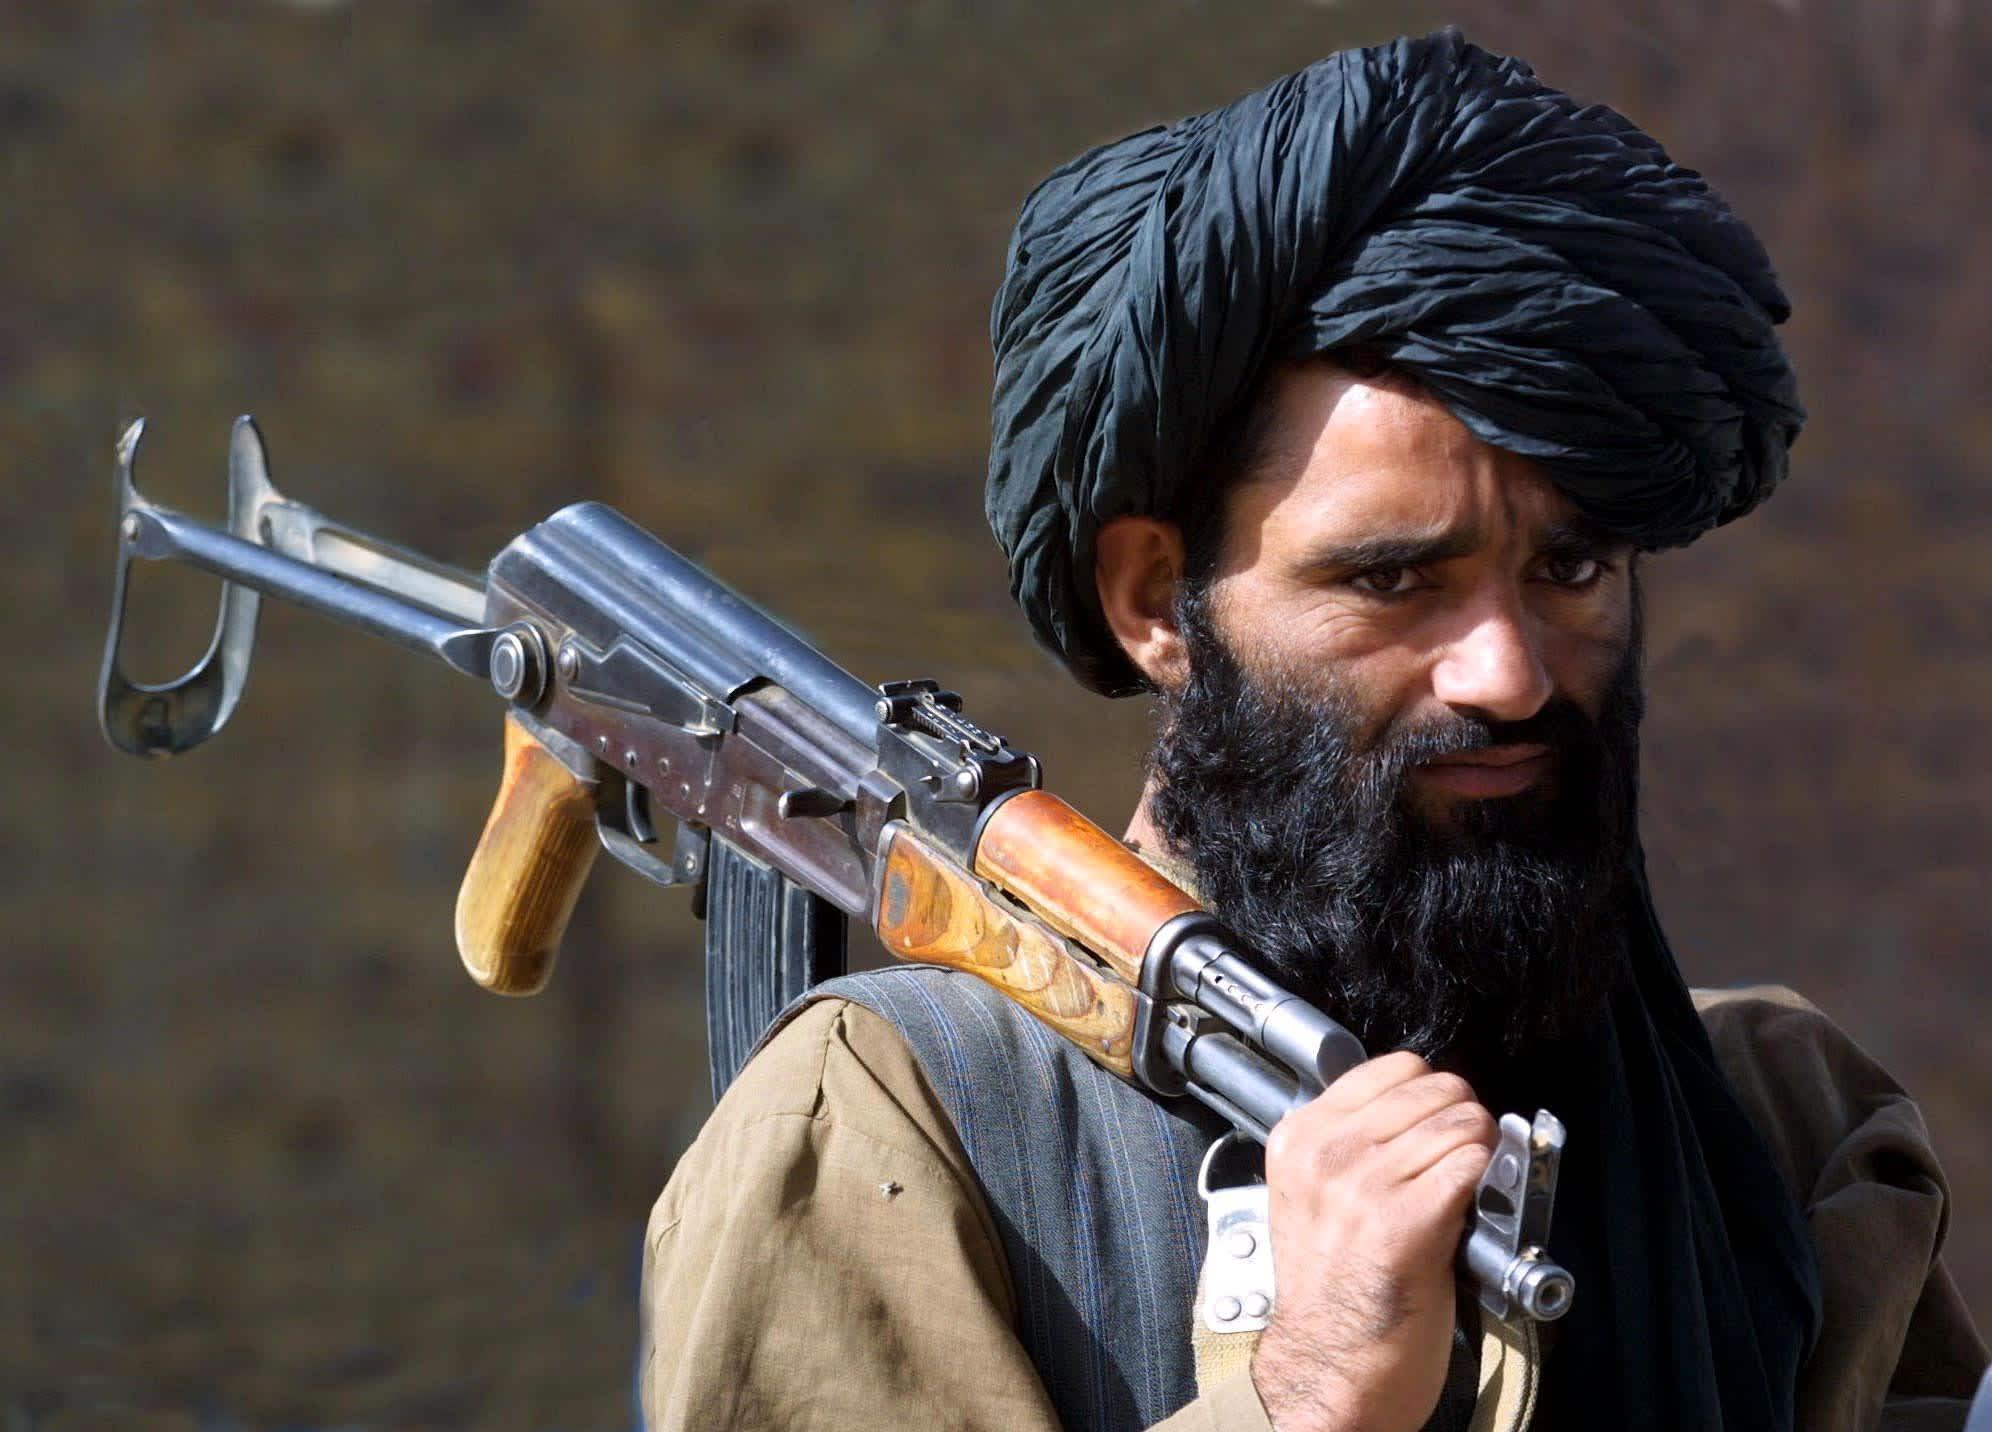 Taliban-sotilas Afganistanissa 21. marraskuuta 2001.